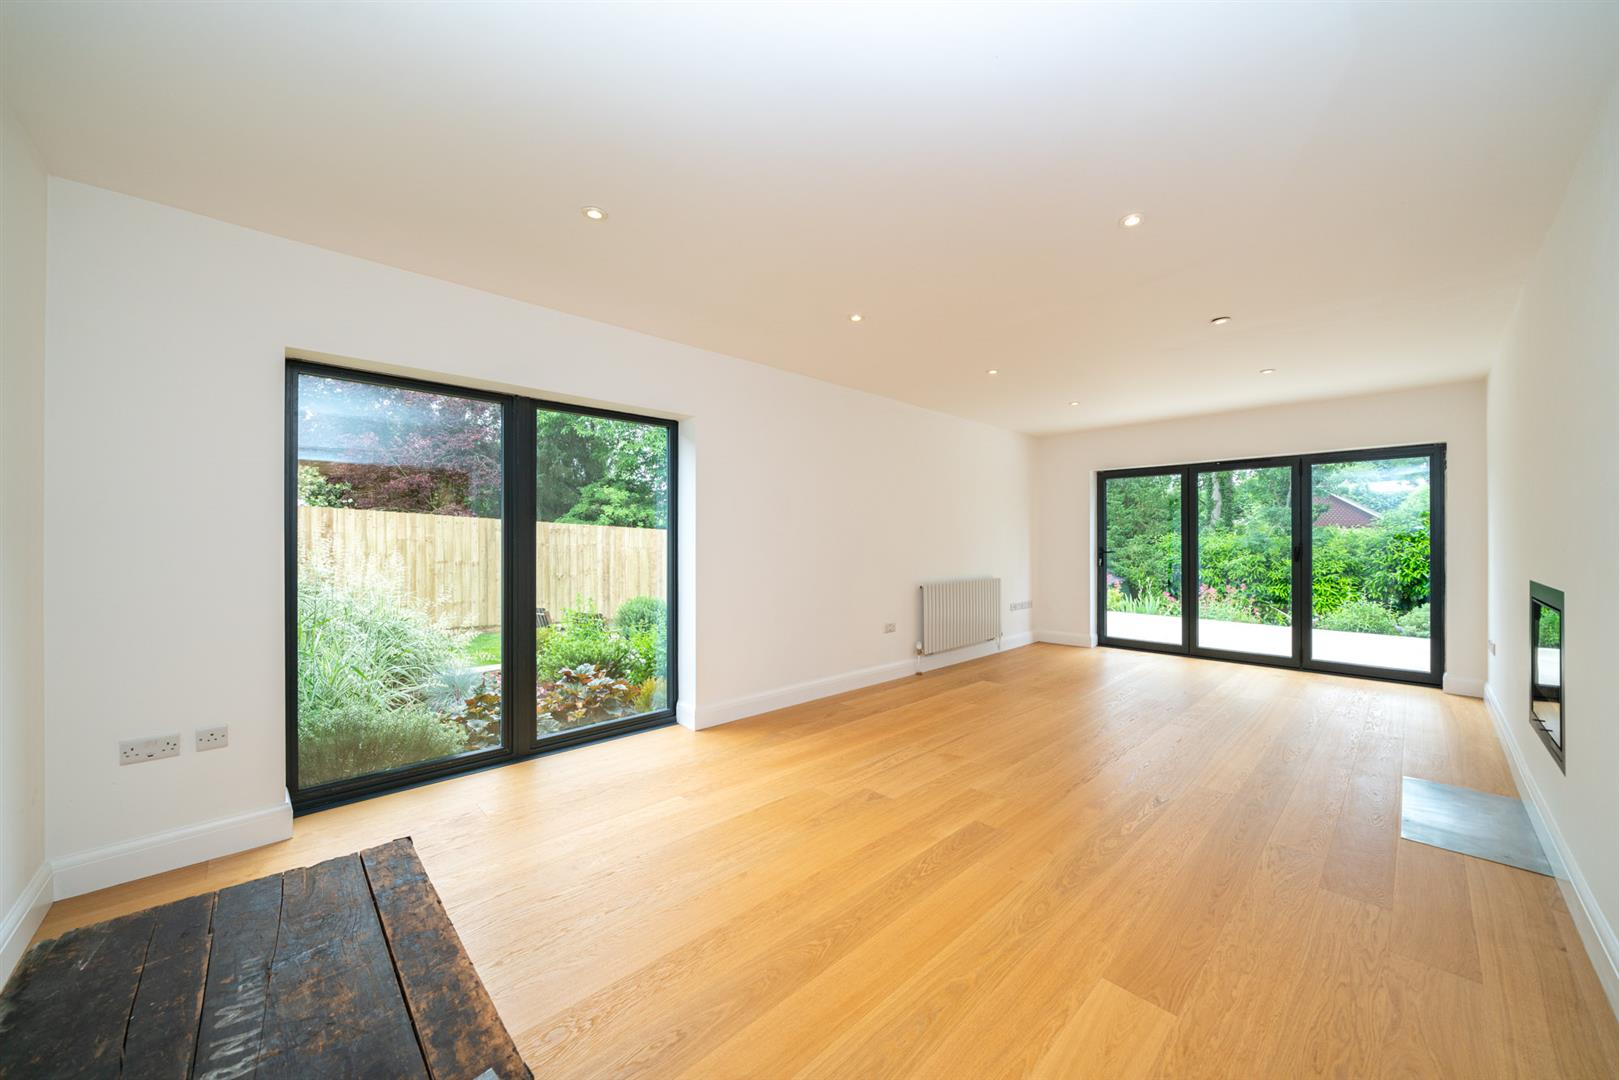 Larchmoor-2991 (1) living room.jpg